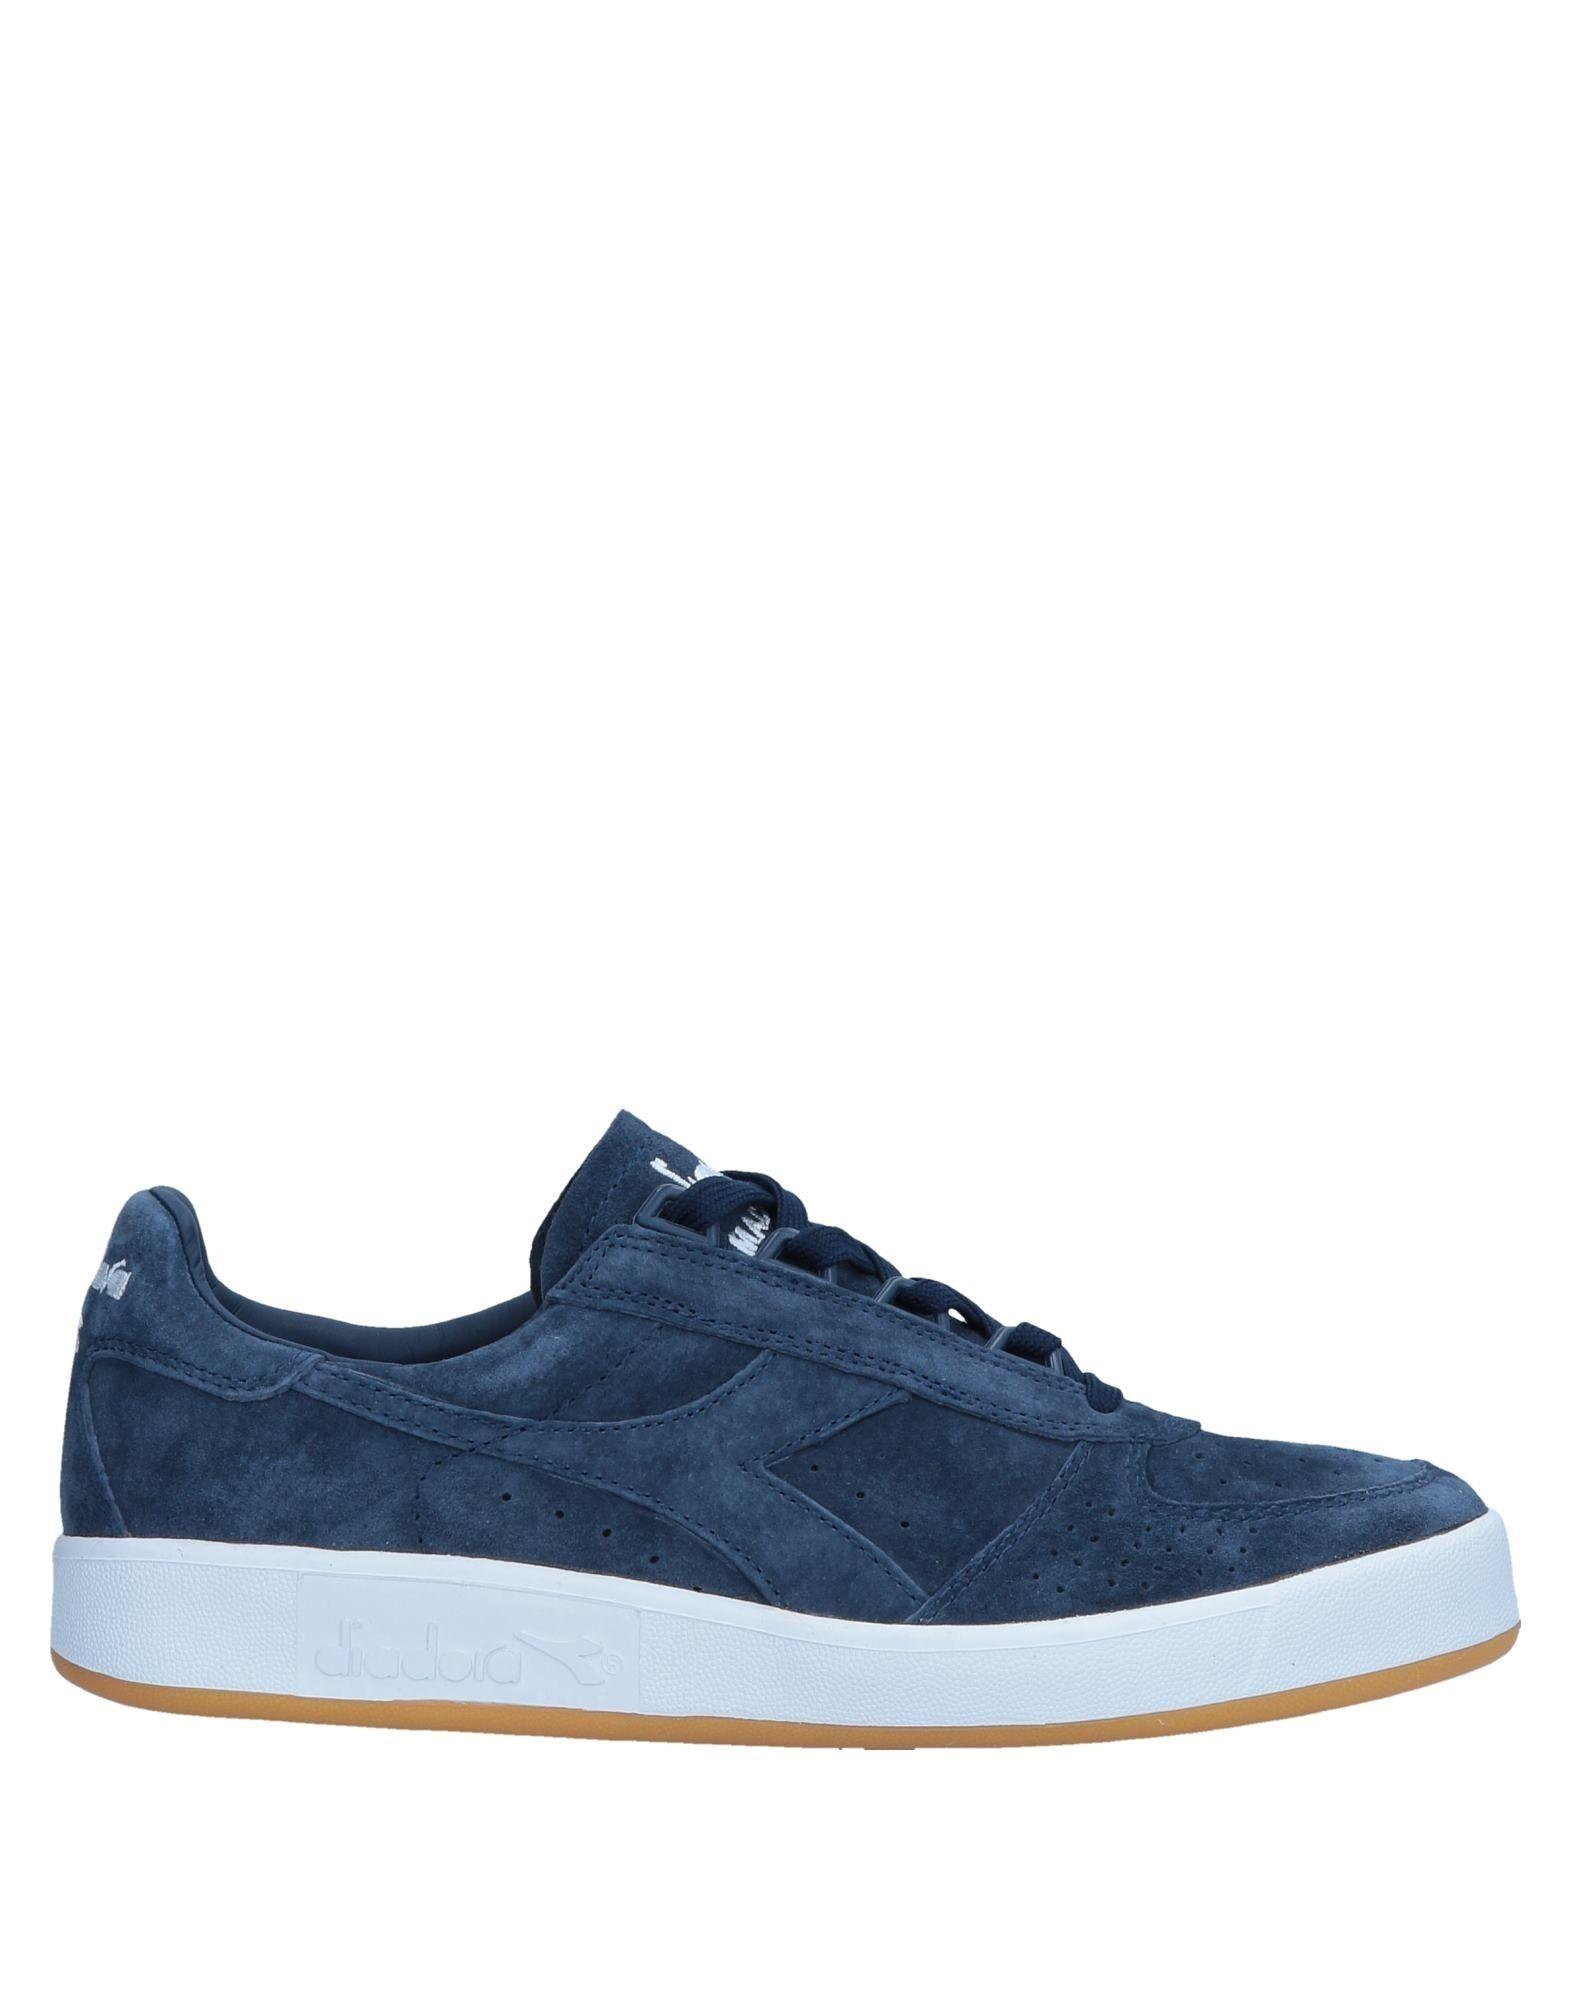 Diadora Sneakers Herren  11557854WD Gute Qualität beliebte Schuhe